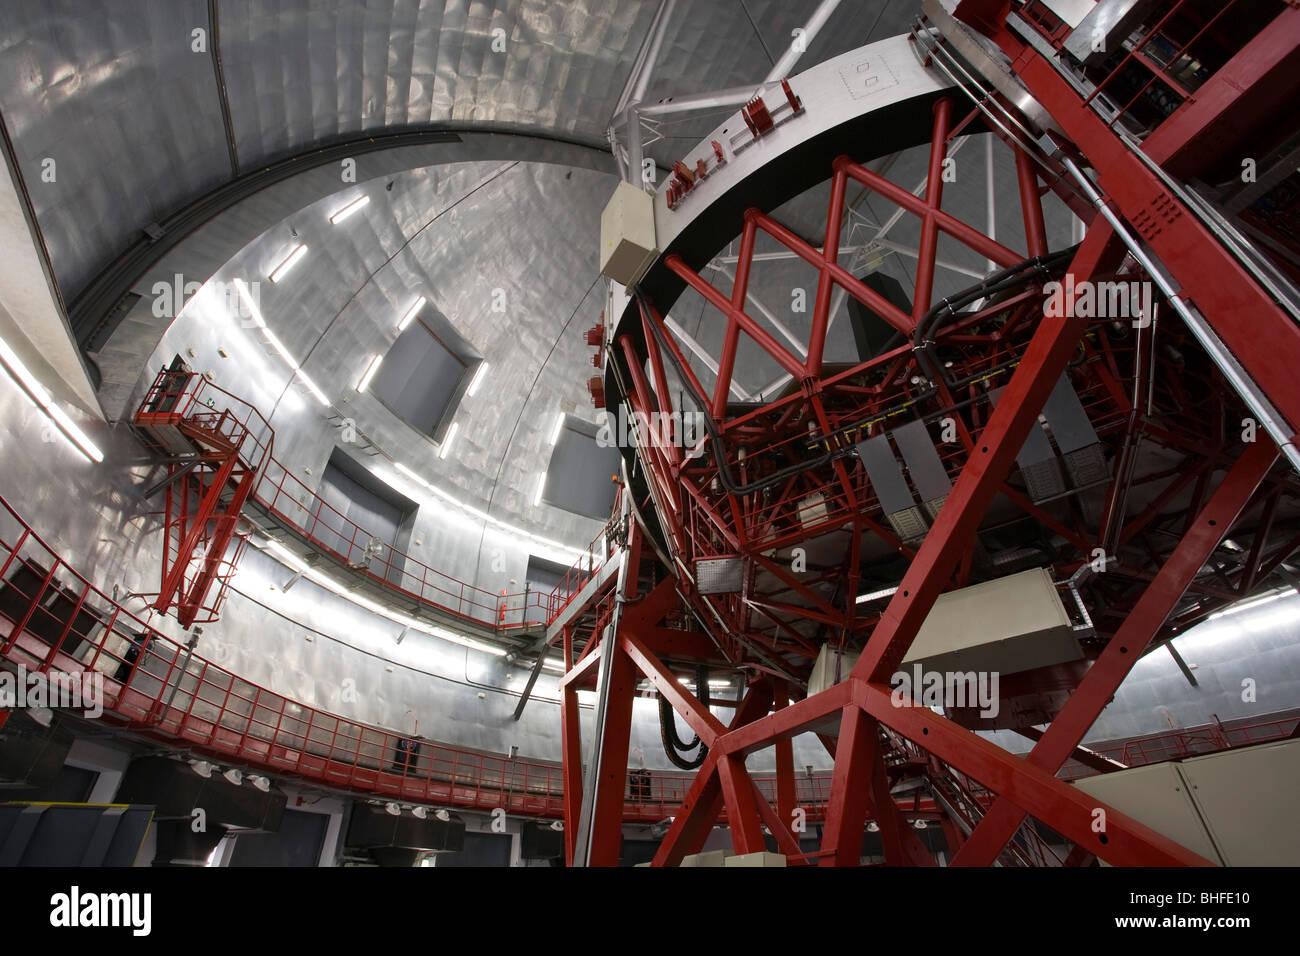 Gran Telescopio Canarias, GranTeCan, GTC, the world's largest mirror telescope, Observatorio Astrofisico, astronomy, - Stock Image